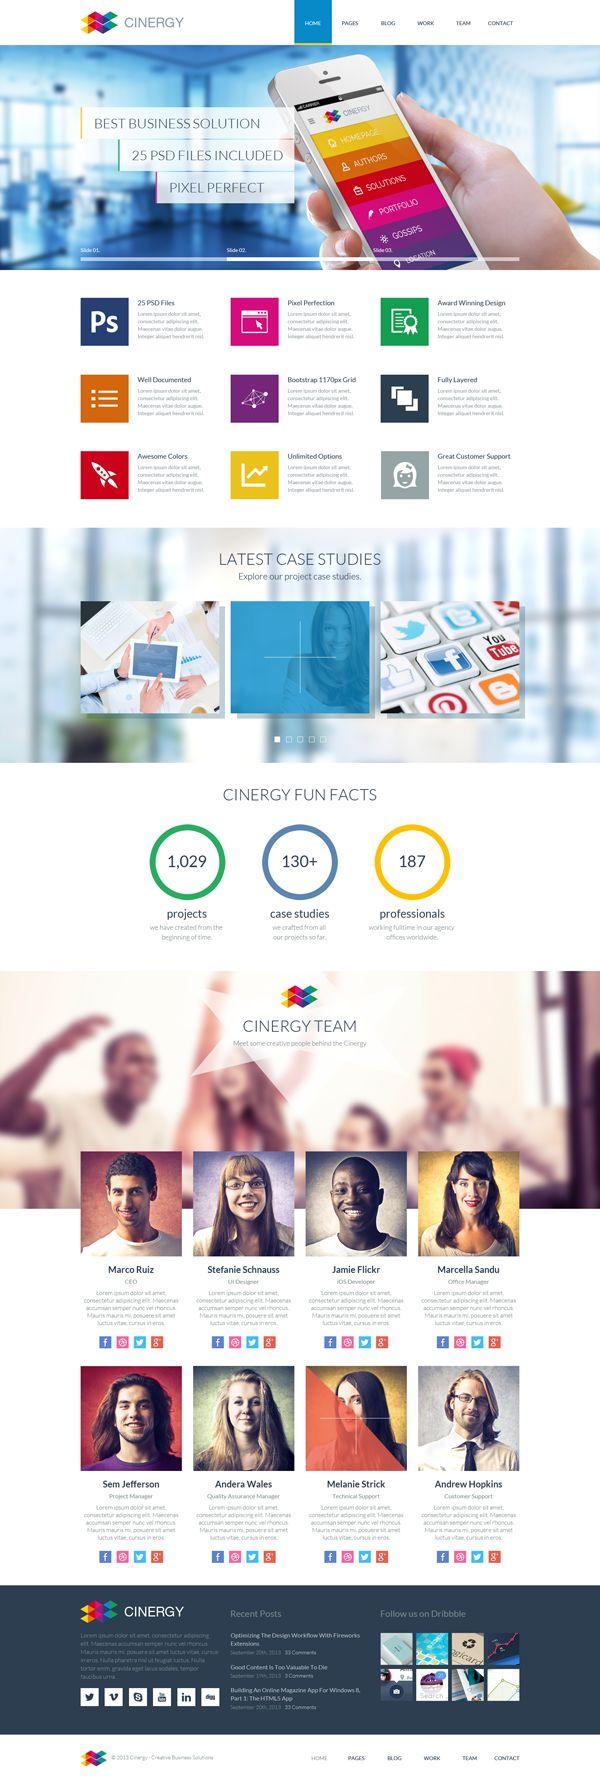 HTML5 Responsive Website Templates | Web Design | Graphic Design Junction